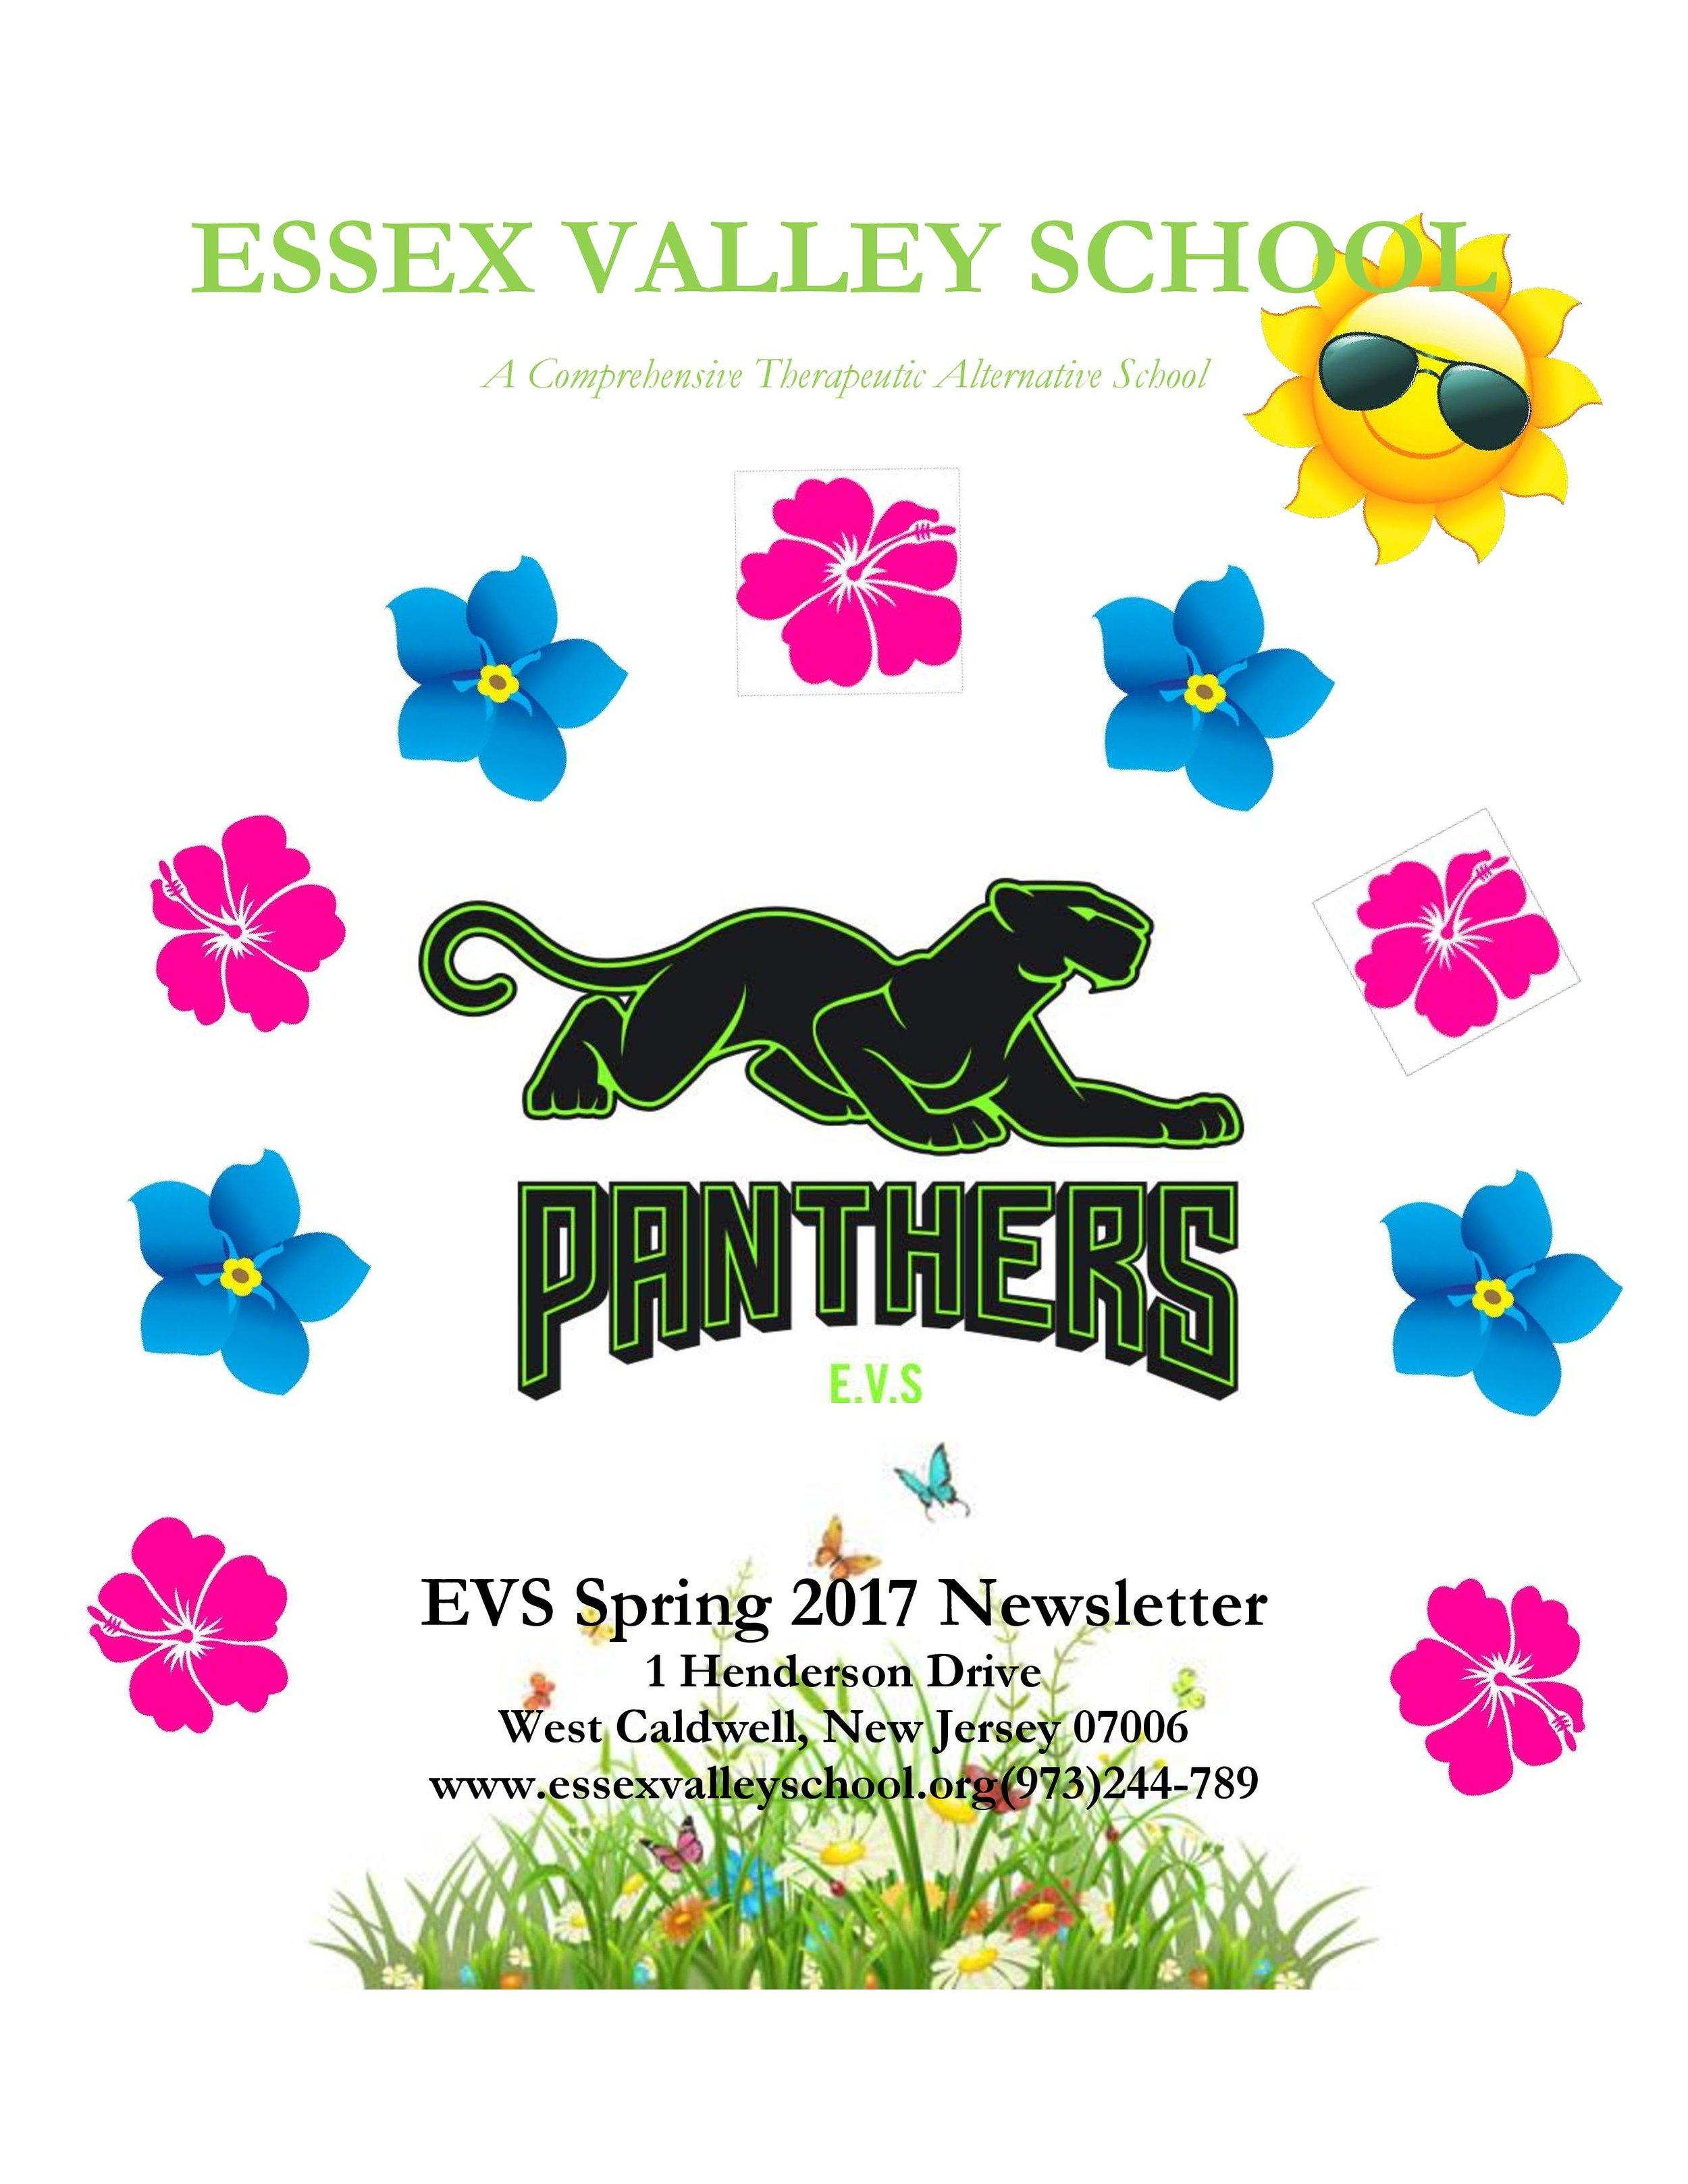 Spring Newsletter Revised 3-22-17-page-001.jpg